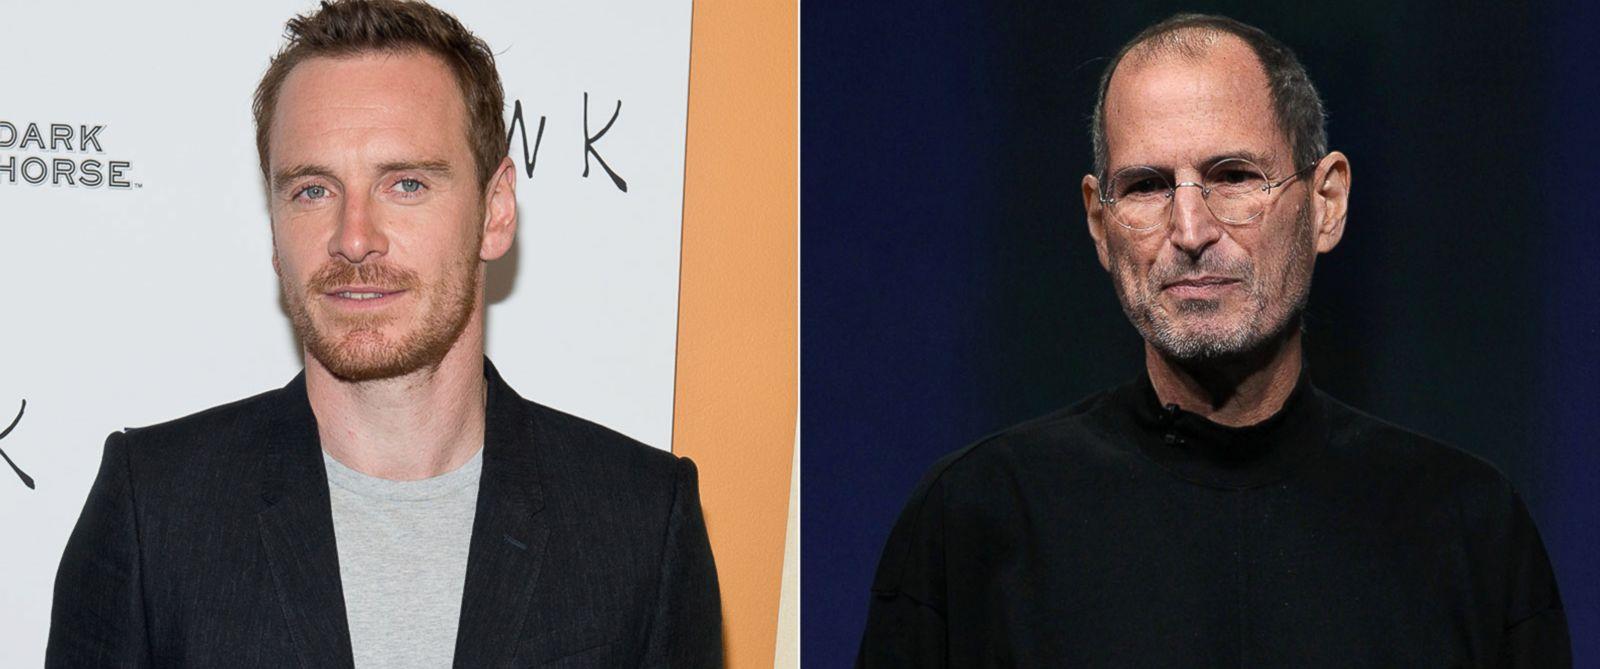 Get the Cast List of the New Steve Jobs Biopic - ABC News